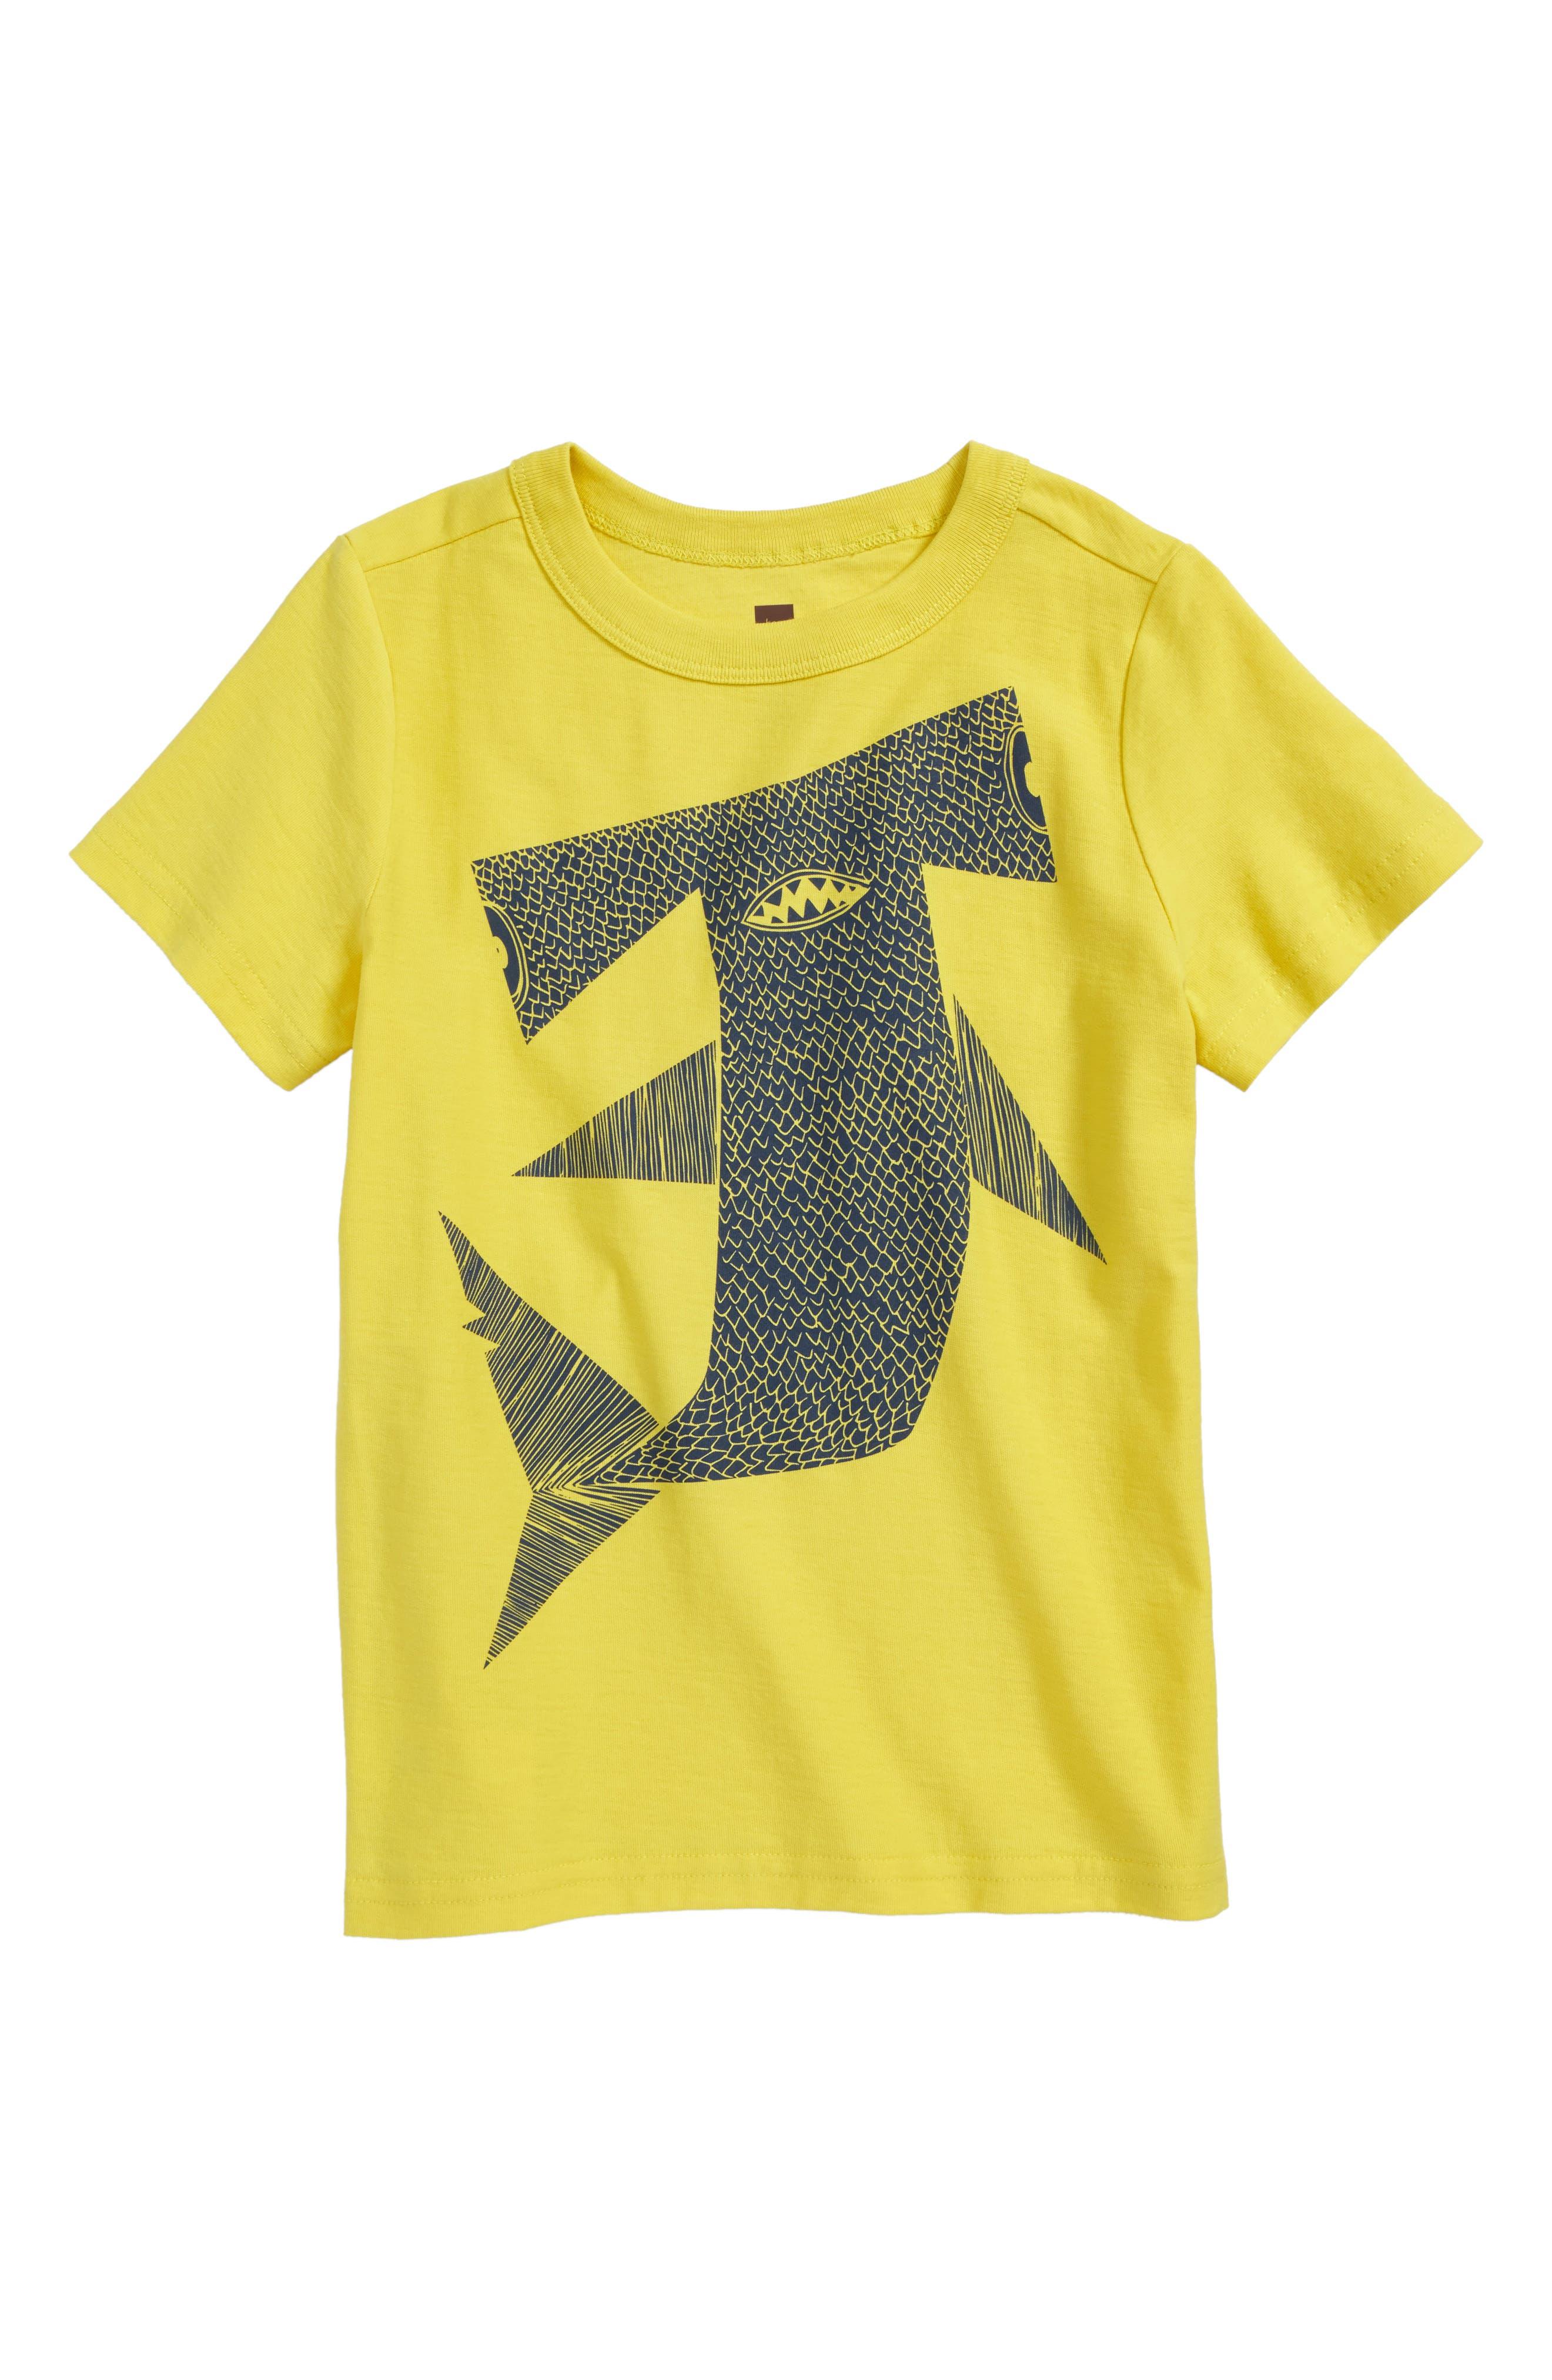 Main Image - Tea Collection Hammer Time T-Shirt (Toddler Boys & Little Boys)